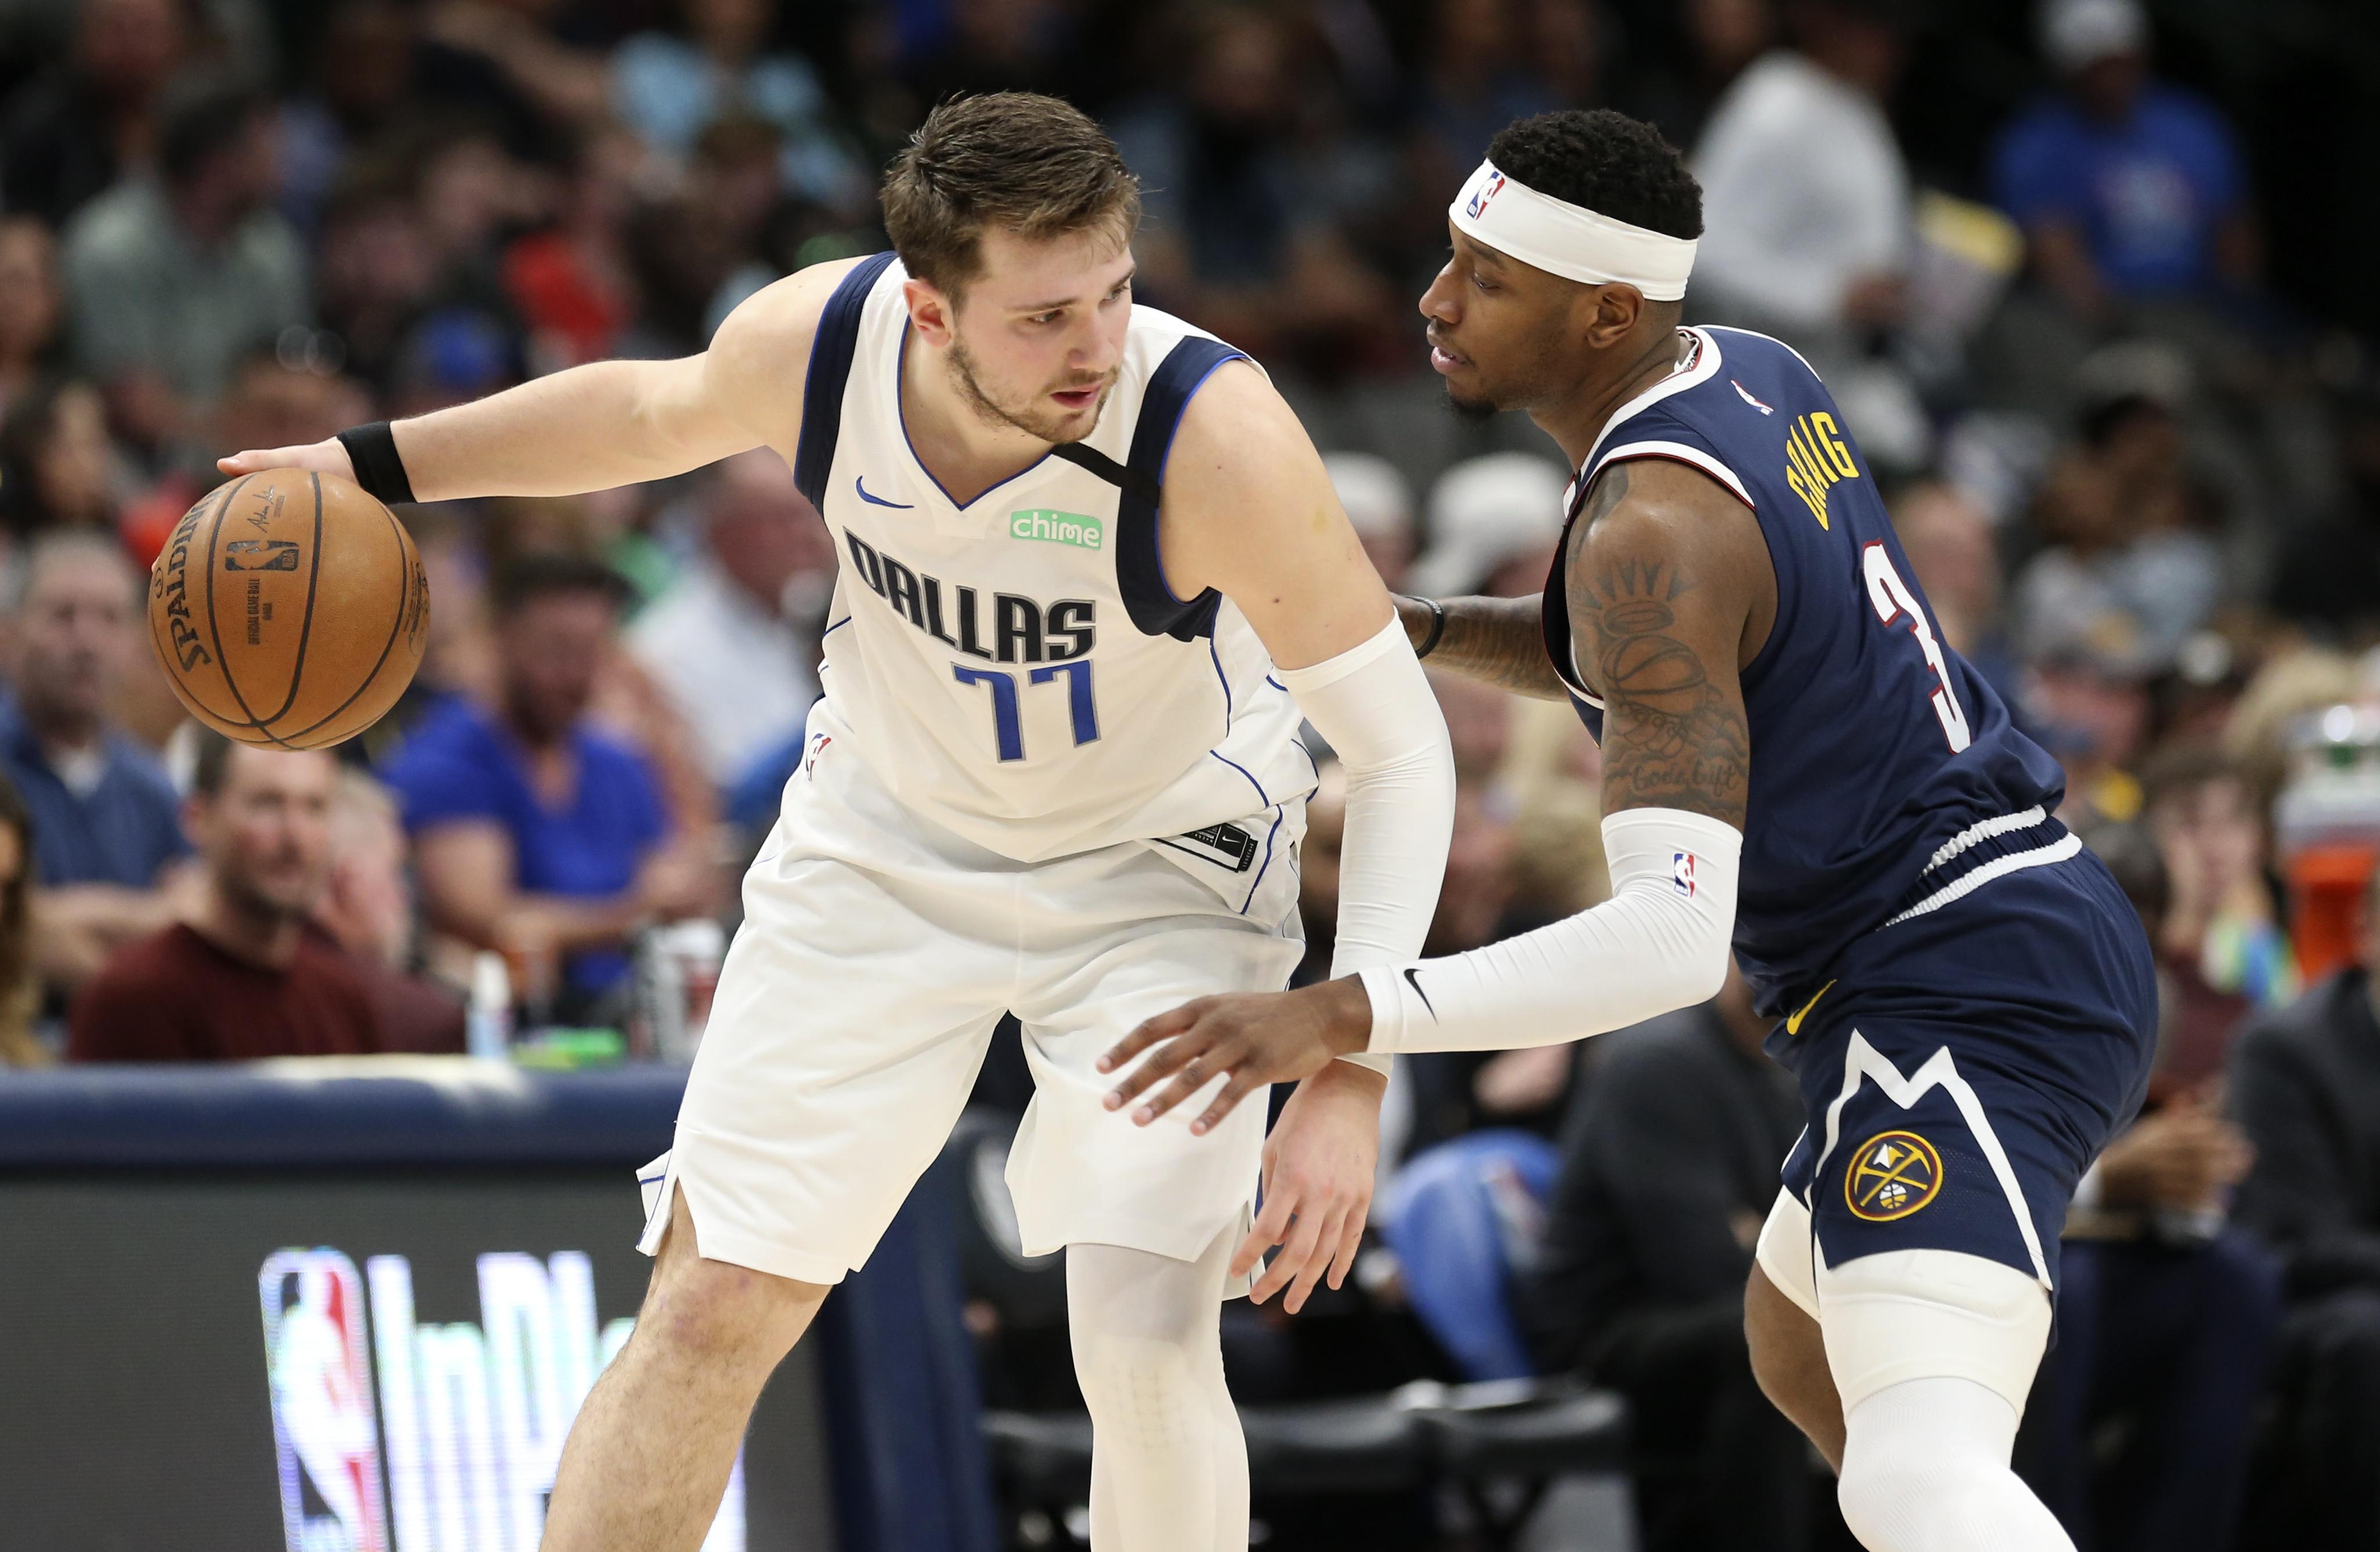 Dallas Mavericks guard Luka Doncic dribbles as Denver Nuggets forward Torrey Craig defends during the second half at American Airlines Center.